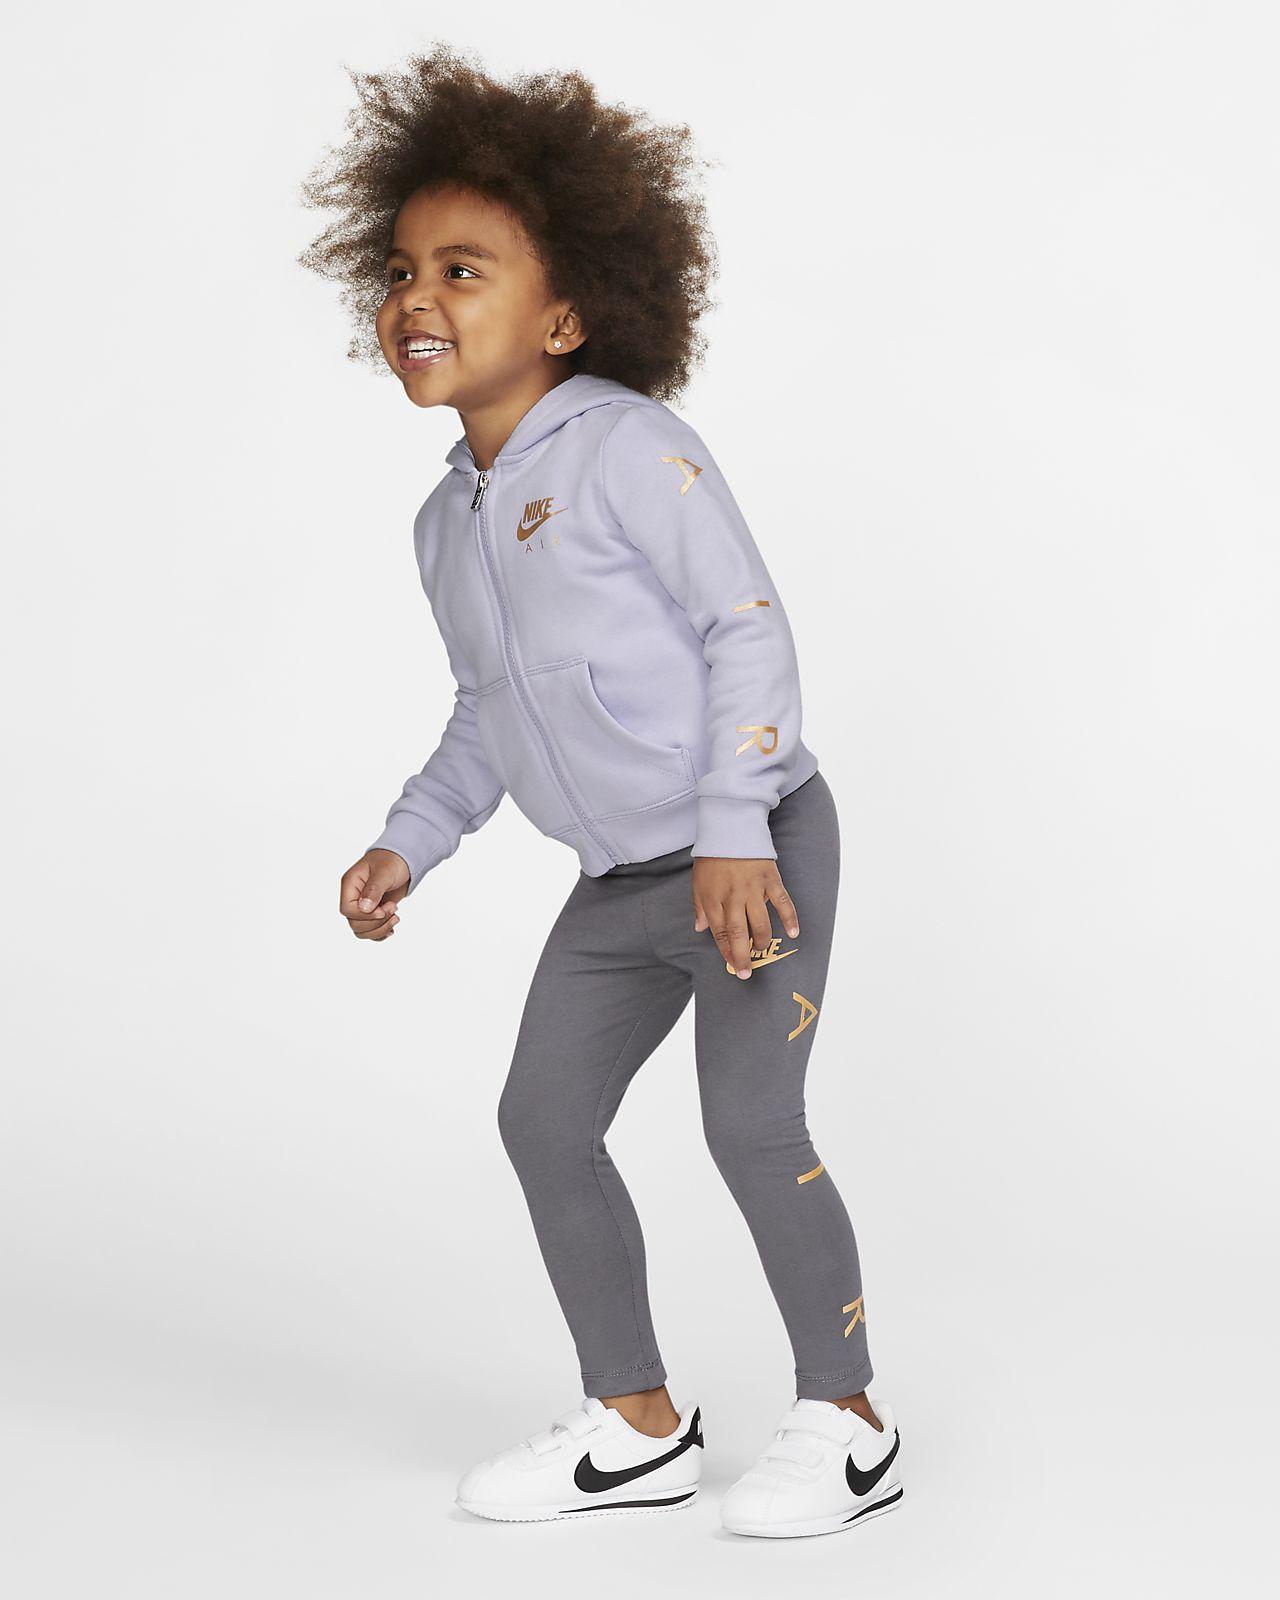 Nike Air Toddler Hoodie and Leggings Set